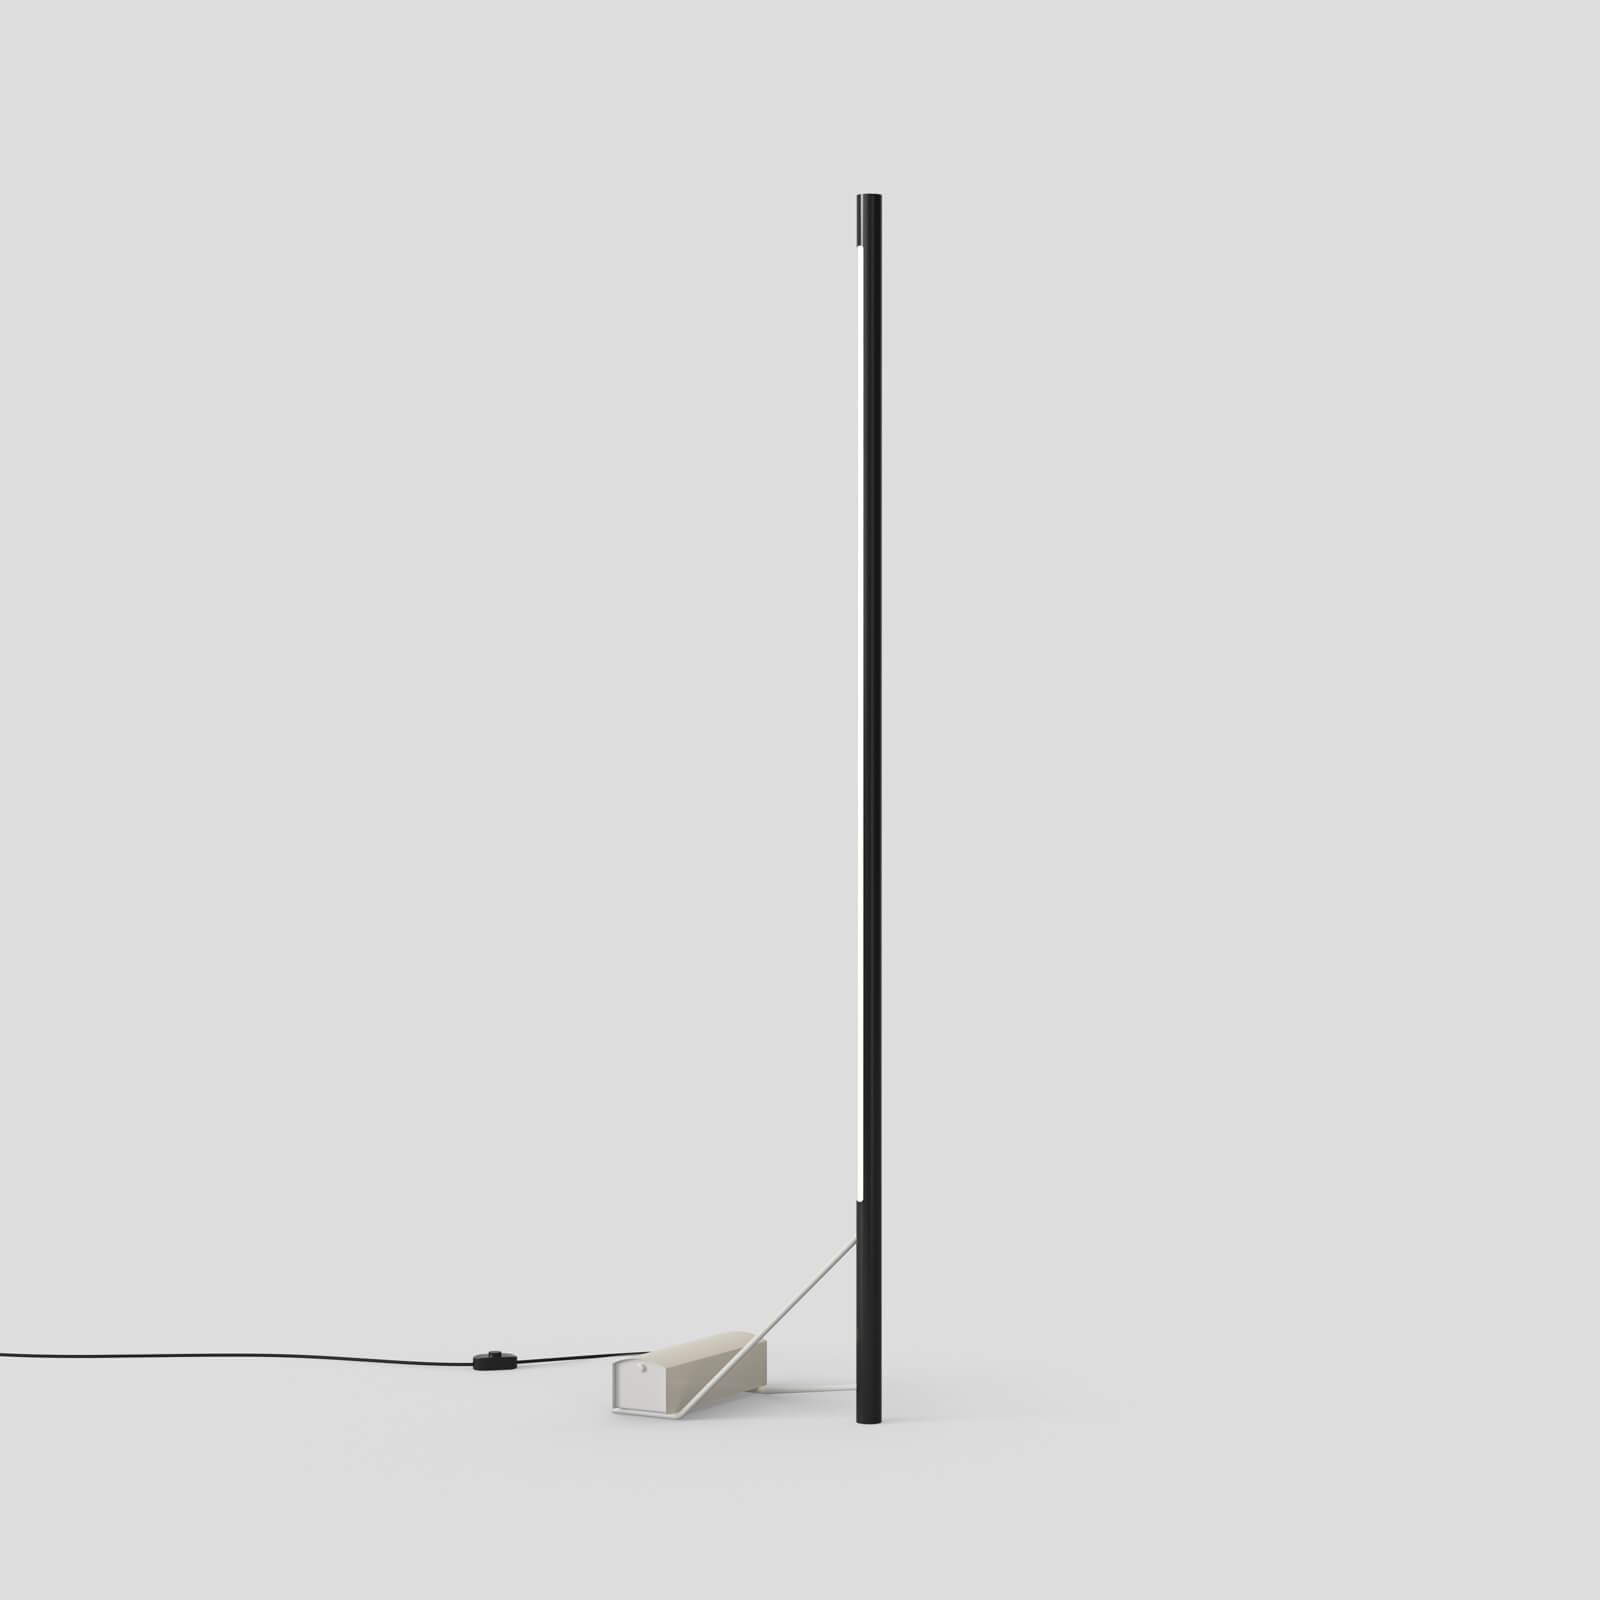 TinnappelMetz-Berlin-Astep-Model-1063-Gino-Sarfatti_01